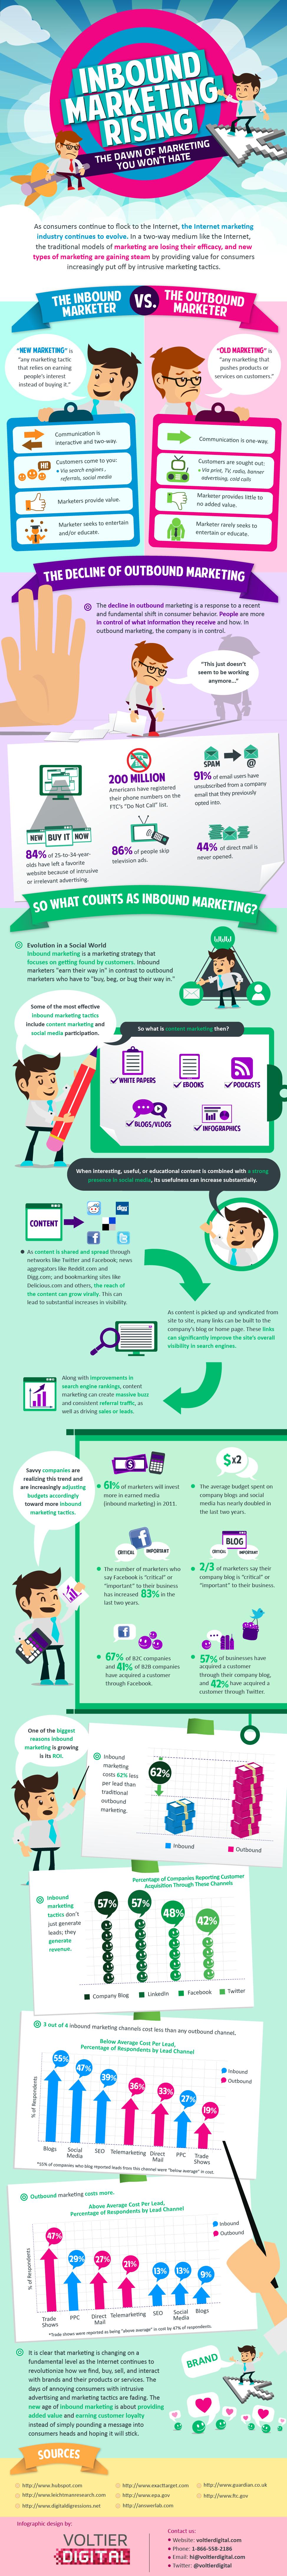 LEADS2opportunities | infographic | inbound marketing en sales